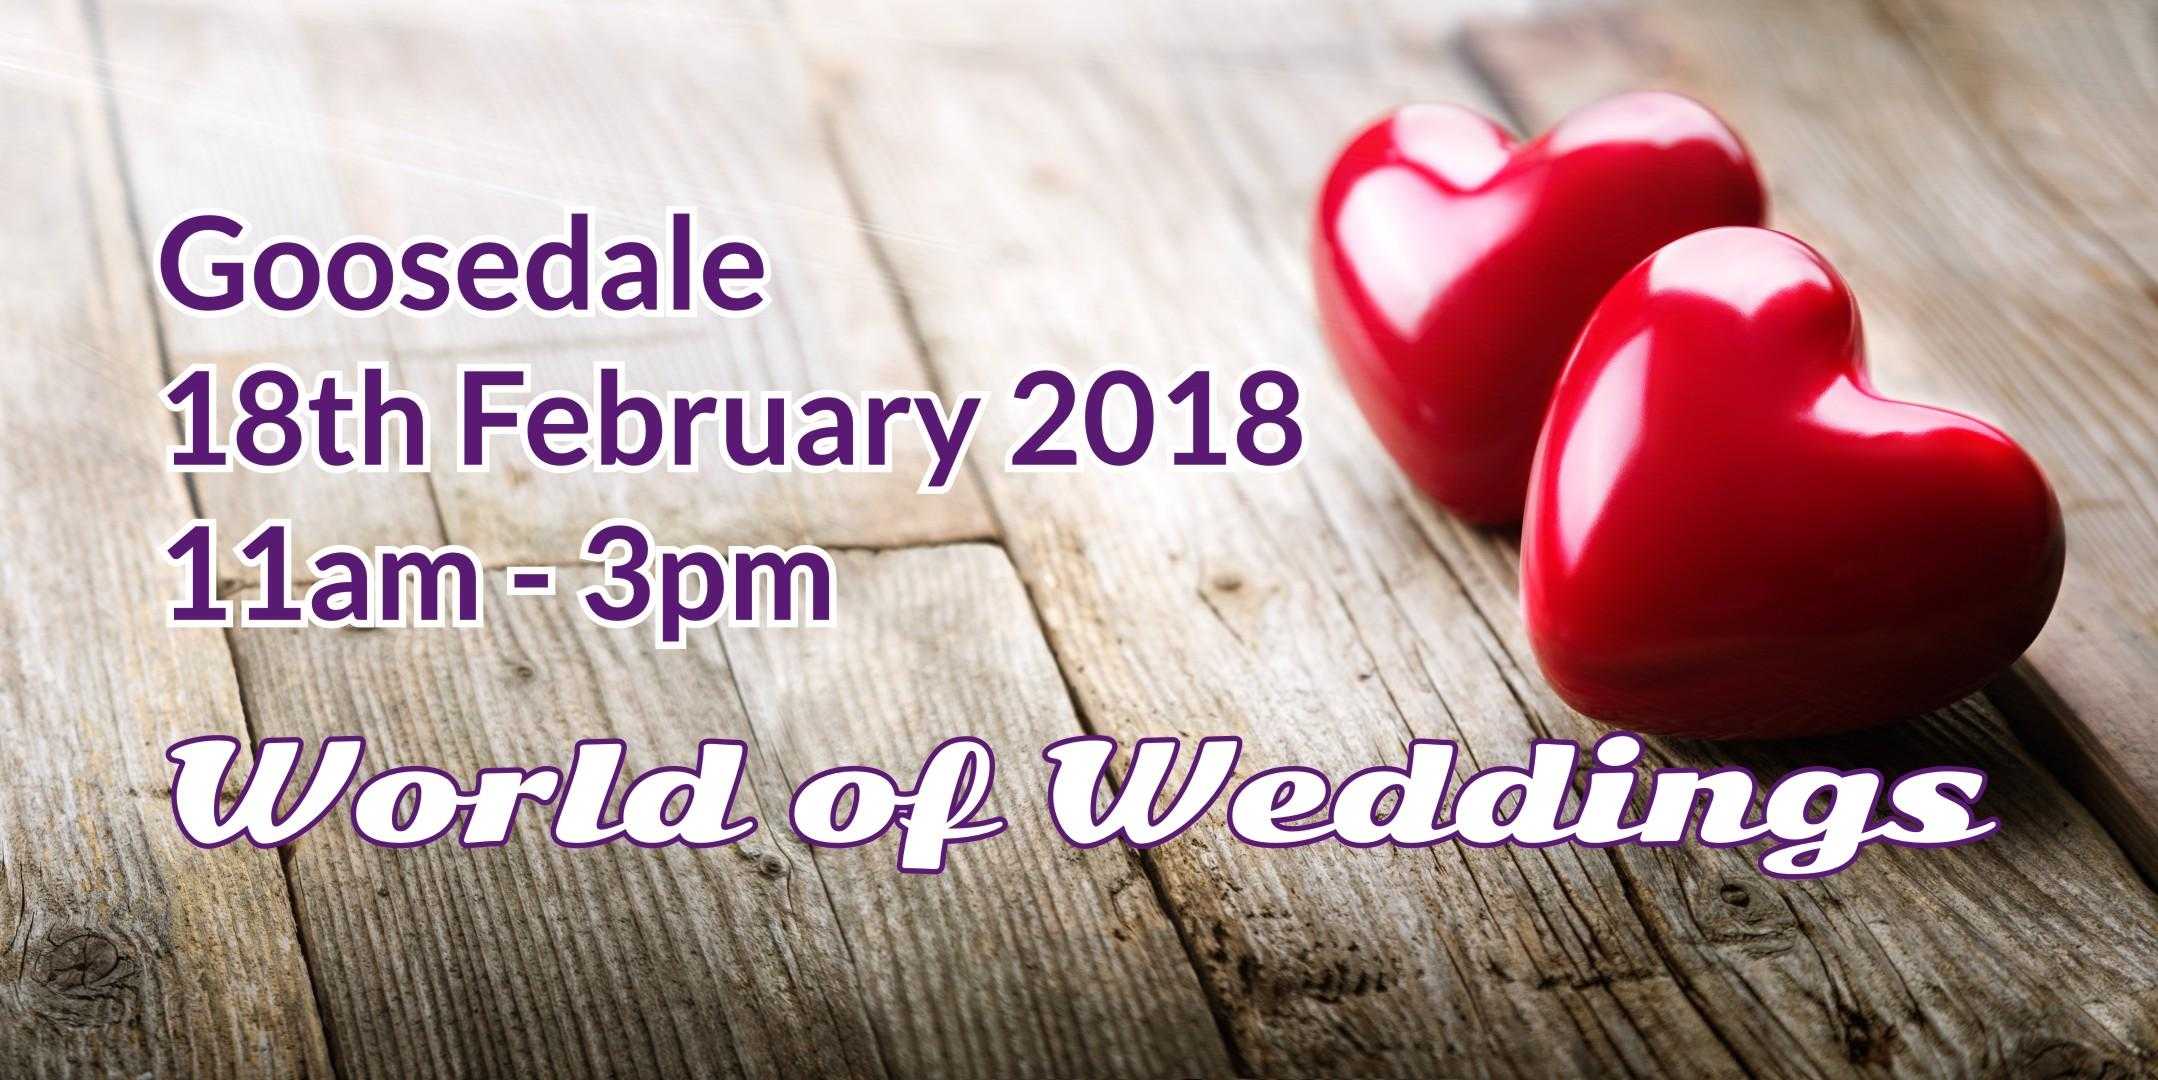 Goosedale World of Weddings